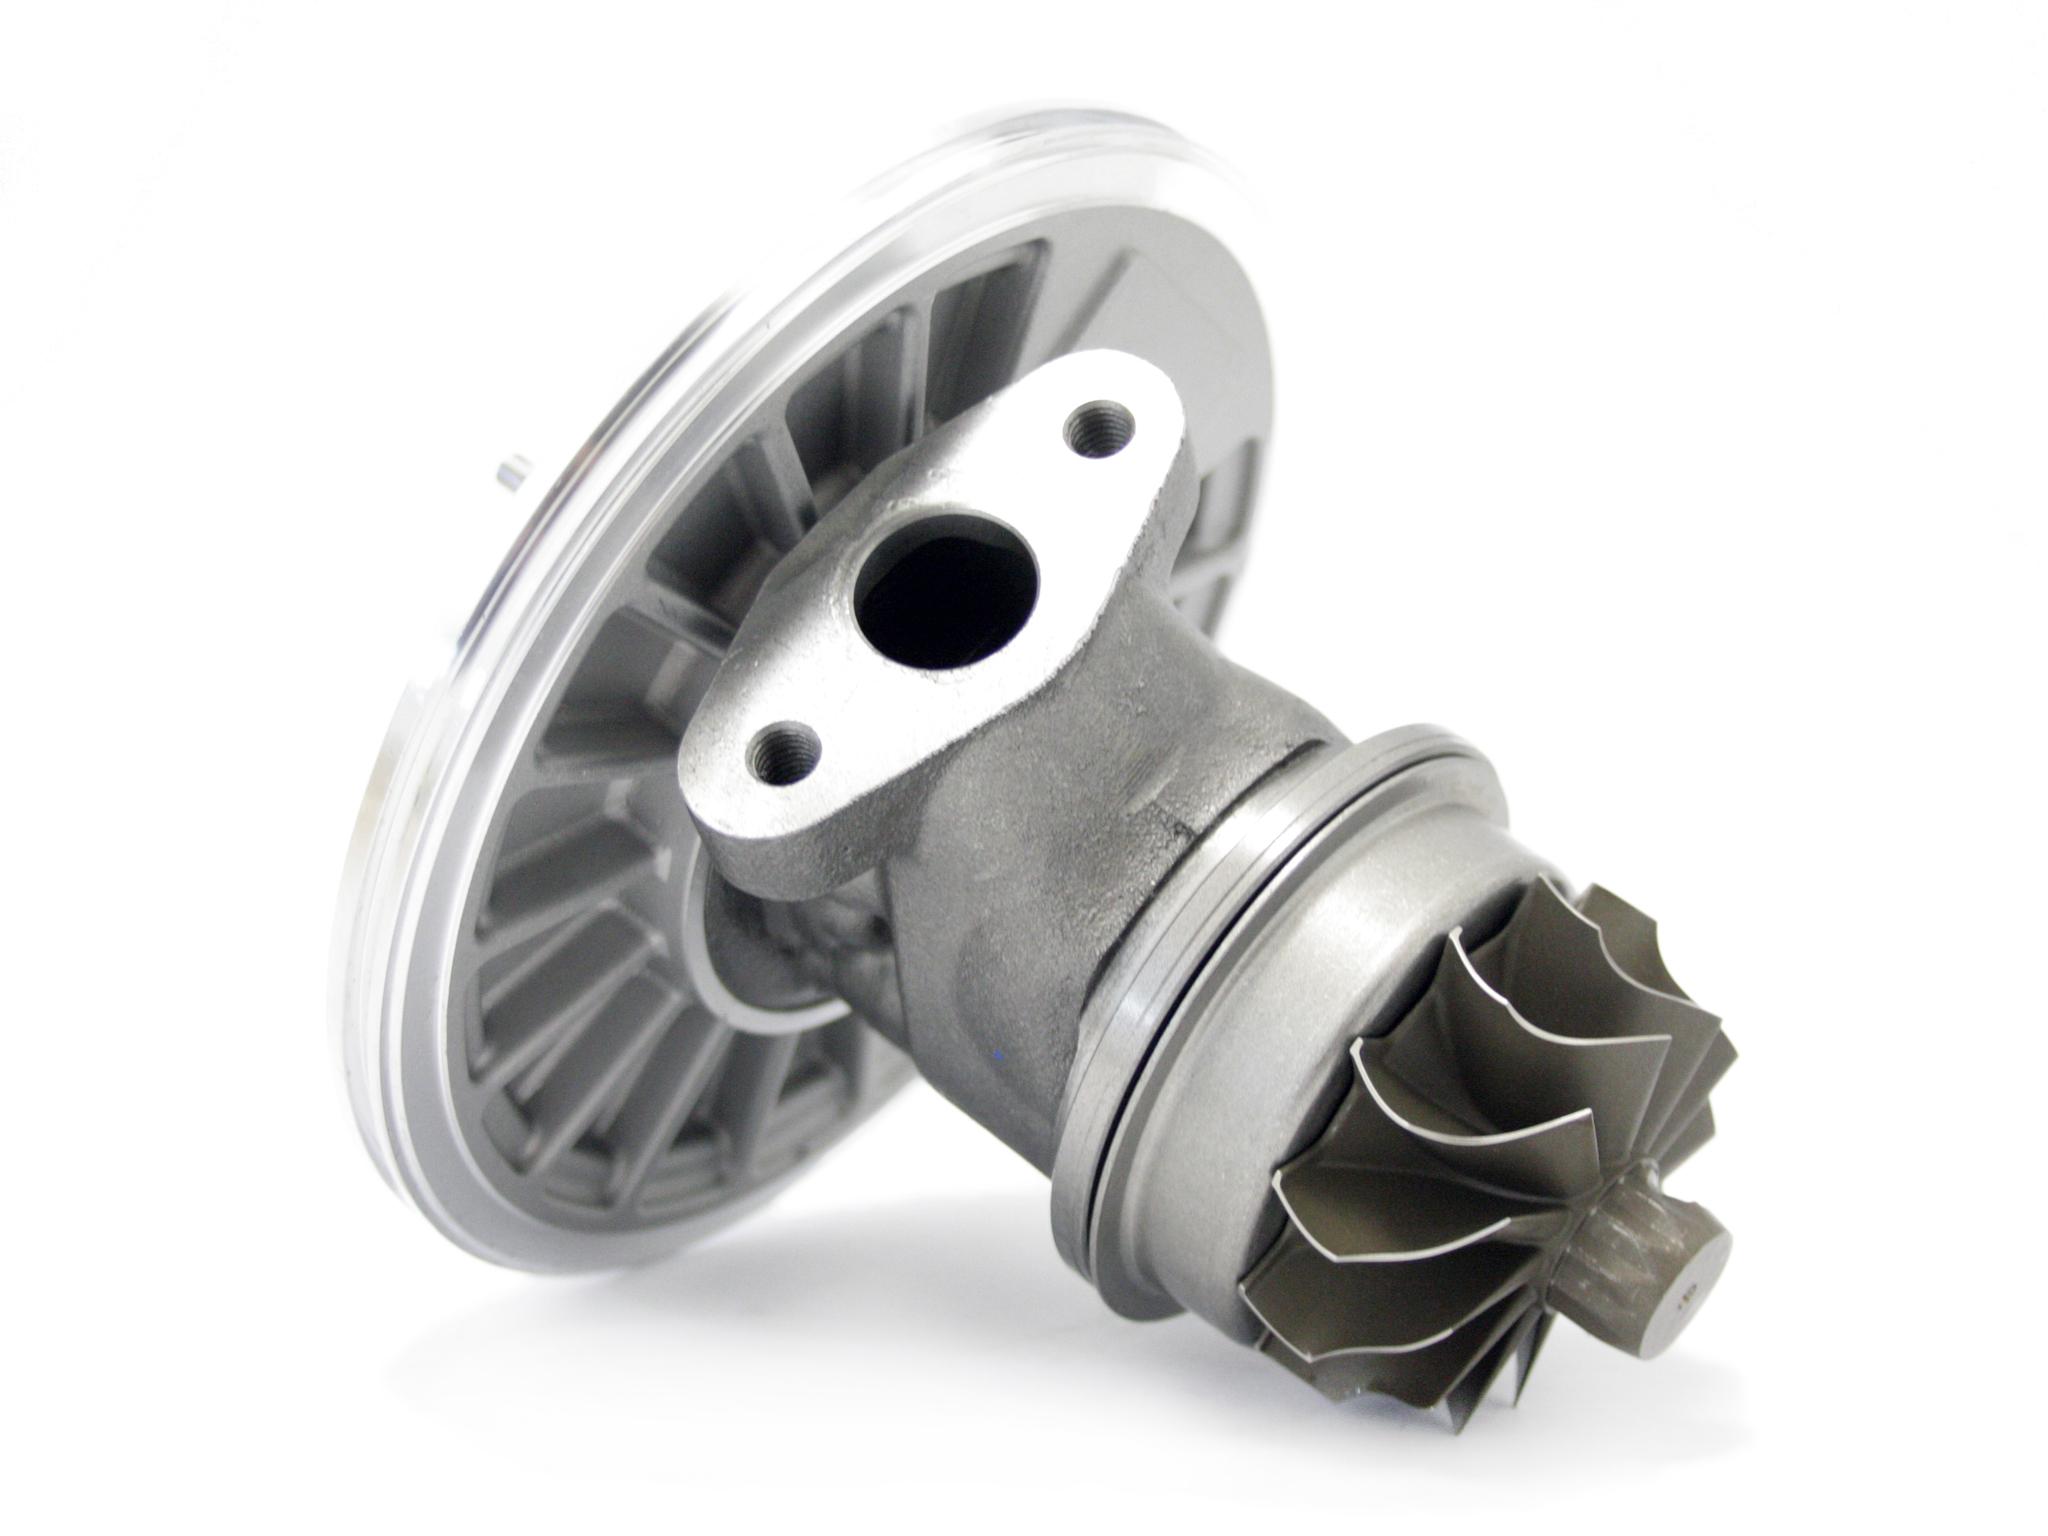 Картридж турбины K26 БМВ 3.0 М57 286 л.с.